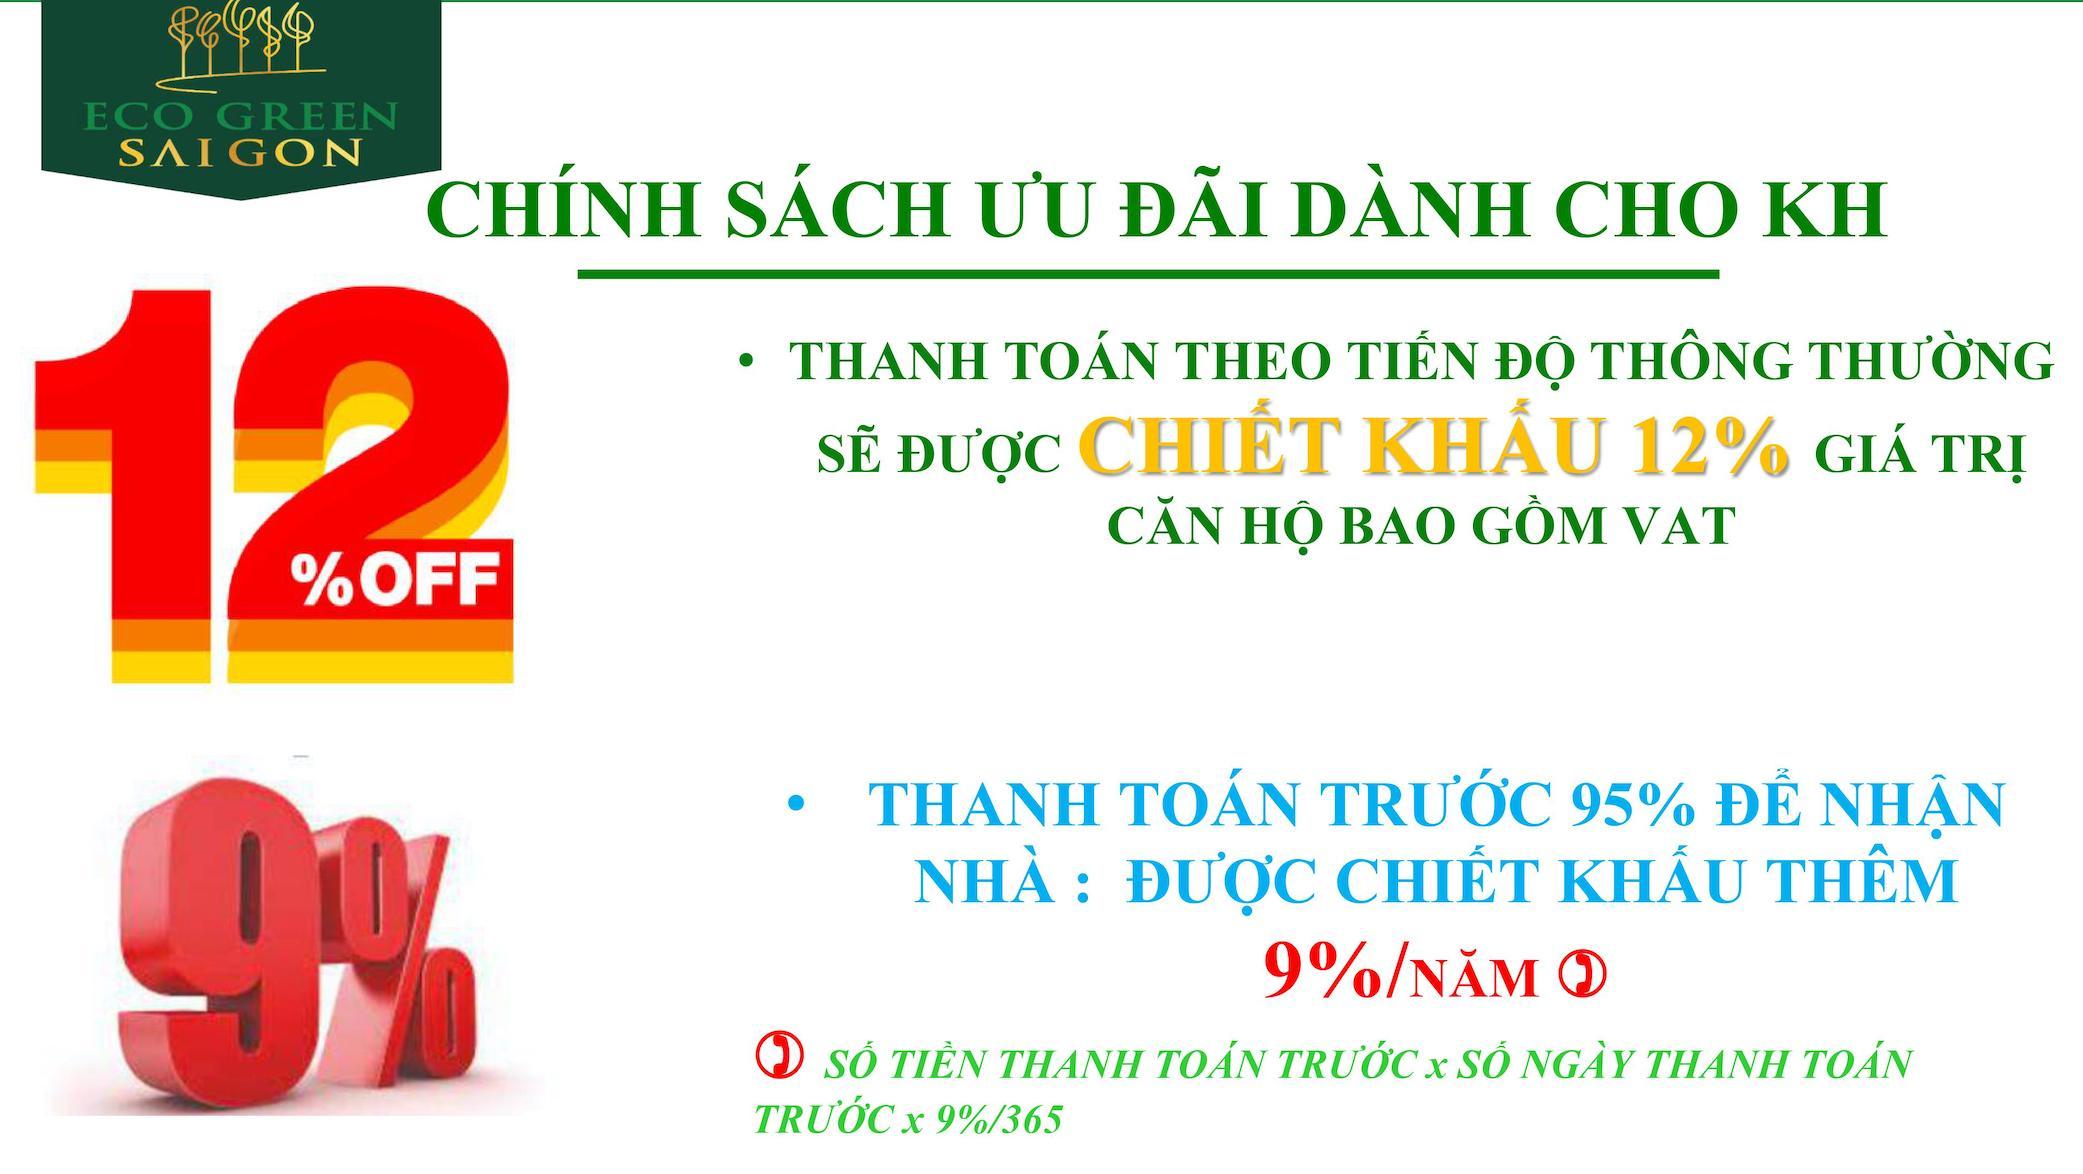 pttt-tien-do-eco-green-sai-gon